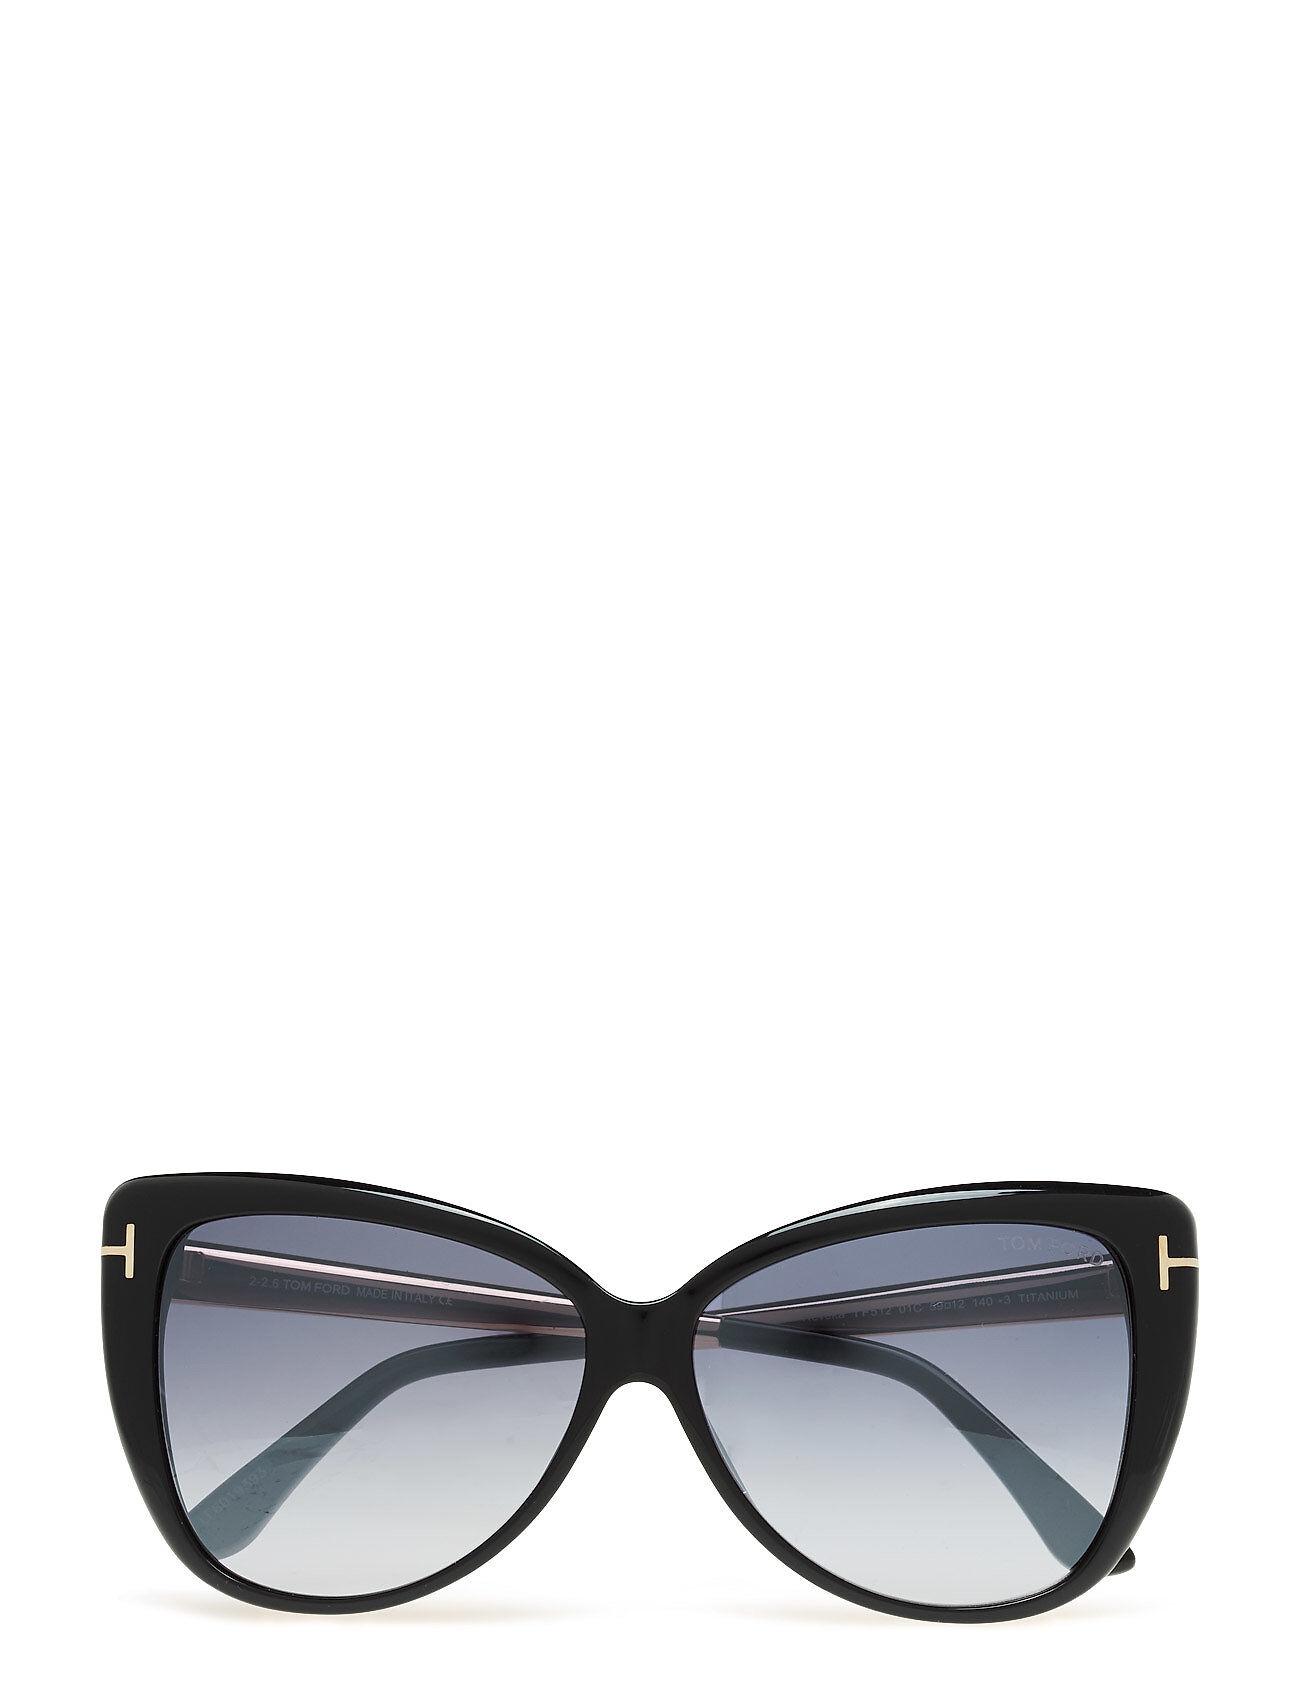 Image of Tom Ford Sunglasses Tom Ford Reveka Aurinkolasit Musta Tom Ford Sunglasses